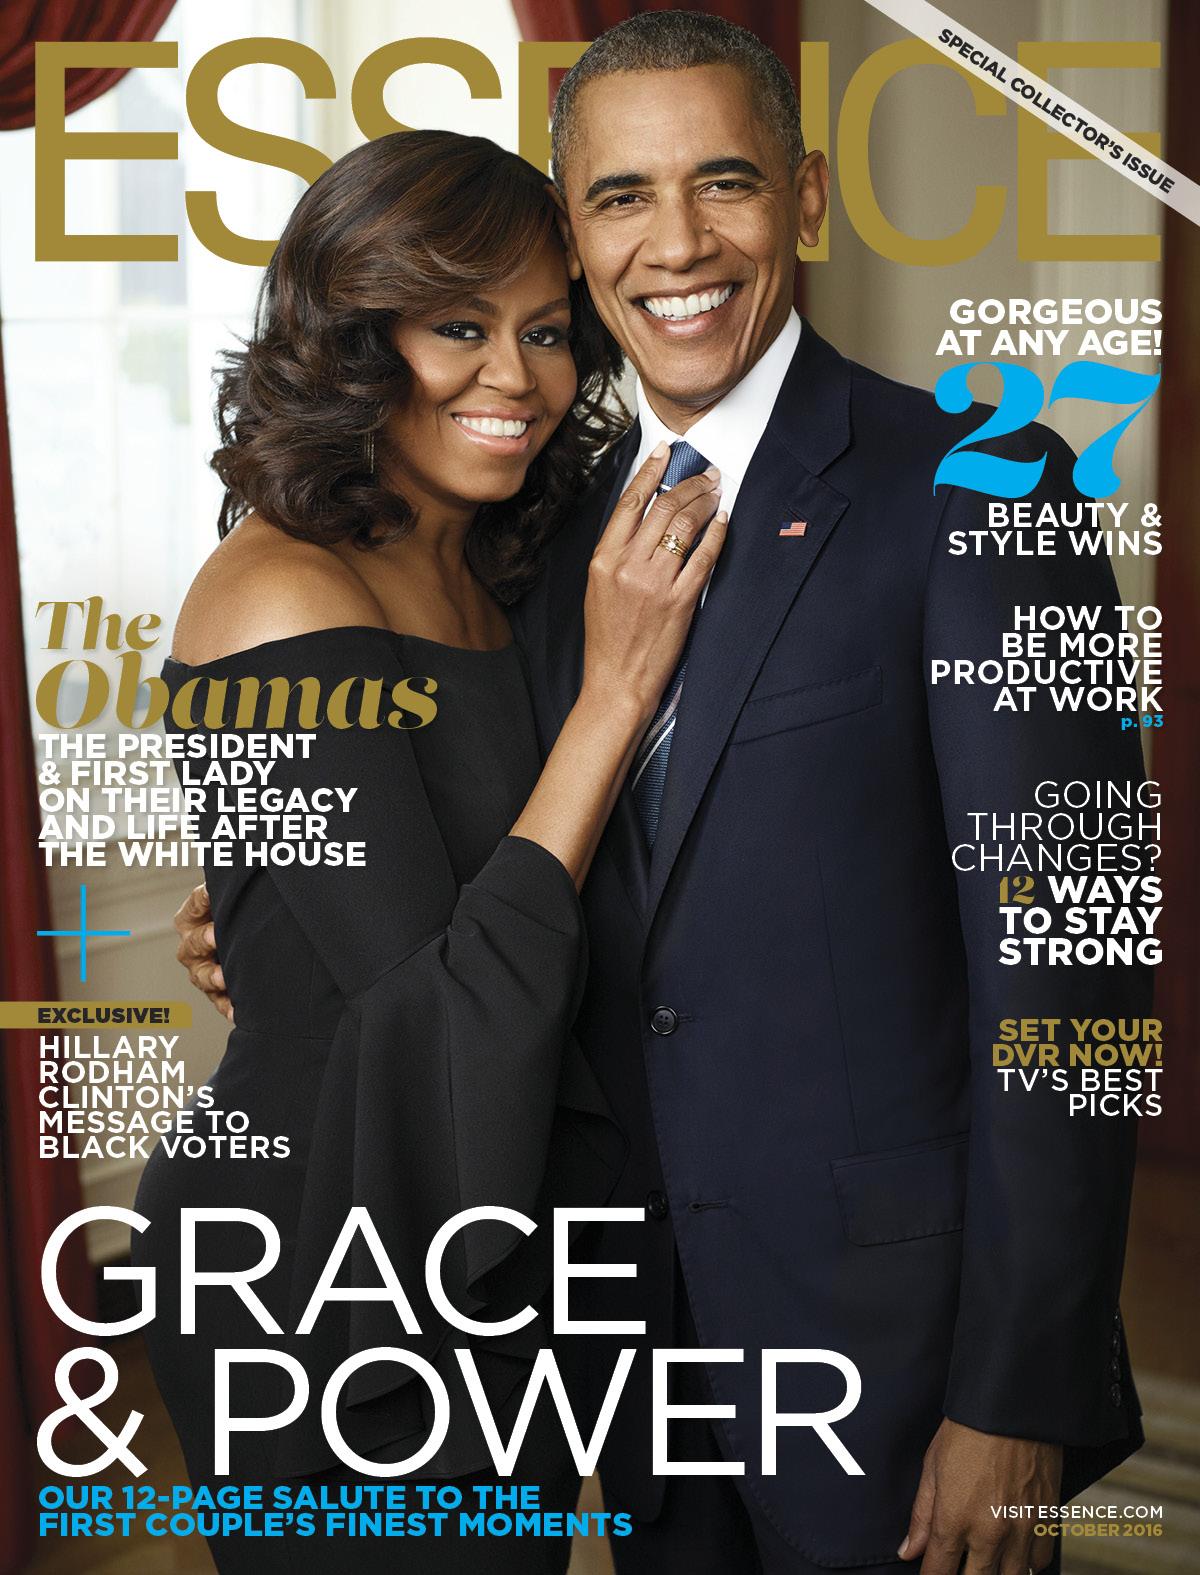 Essence Magazine, October 2016 issue.